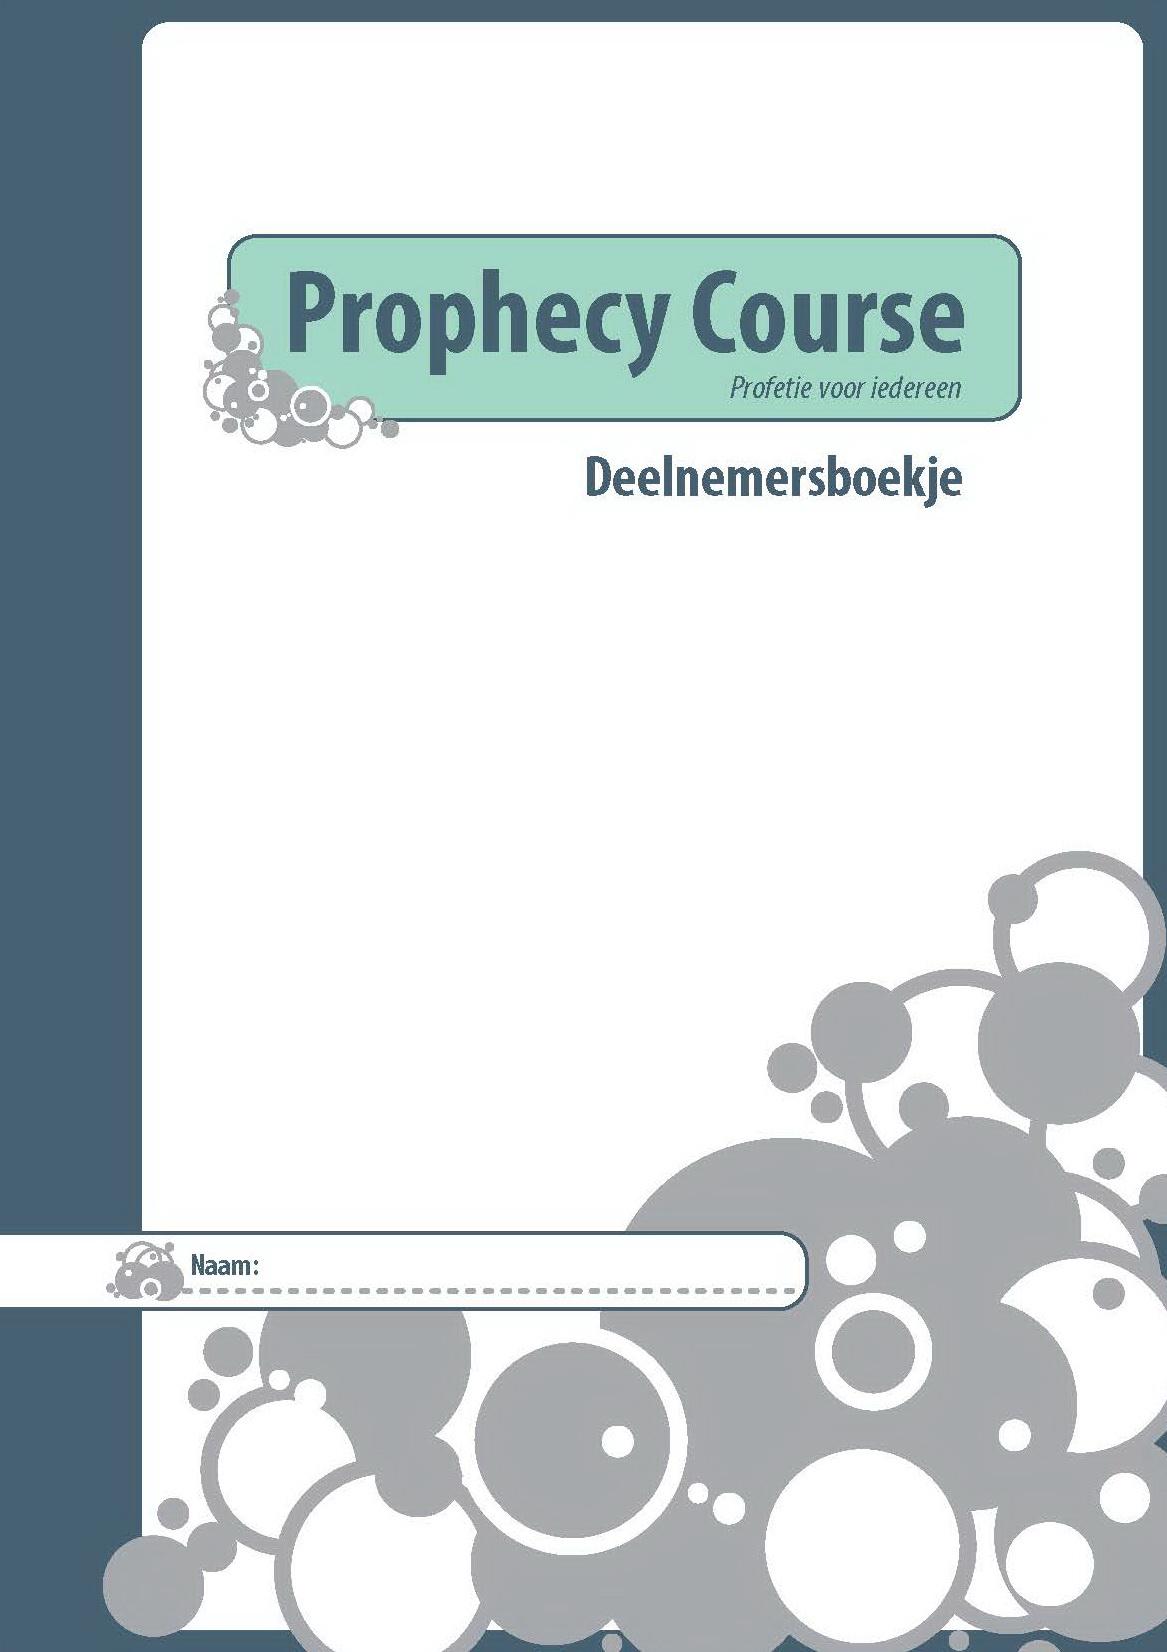 Prophecy Course (deelnemers)